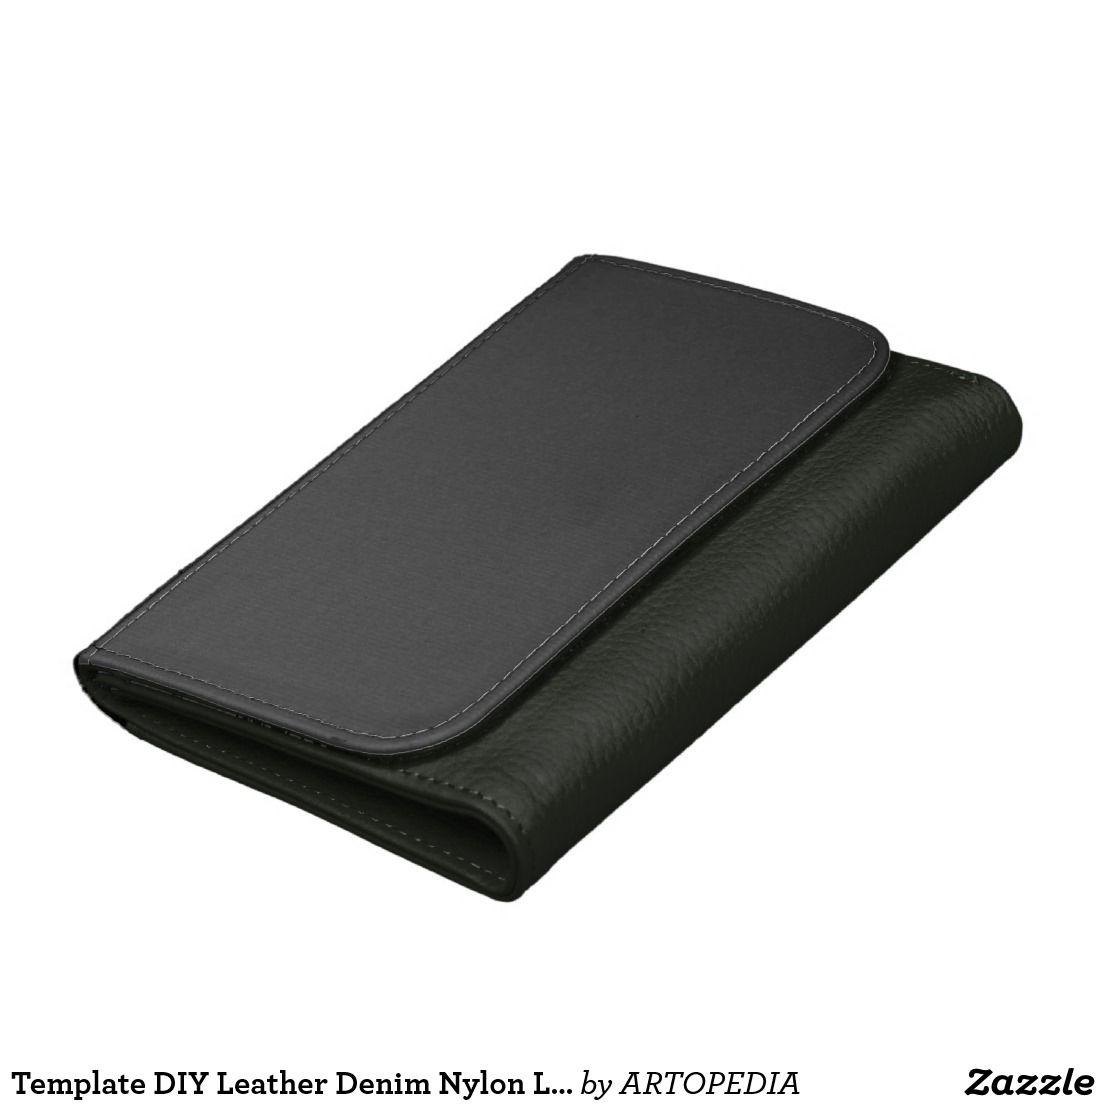 Template DIY Leather Denim Nylon Large Medium Gift Wallet | 101 ...